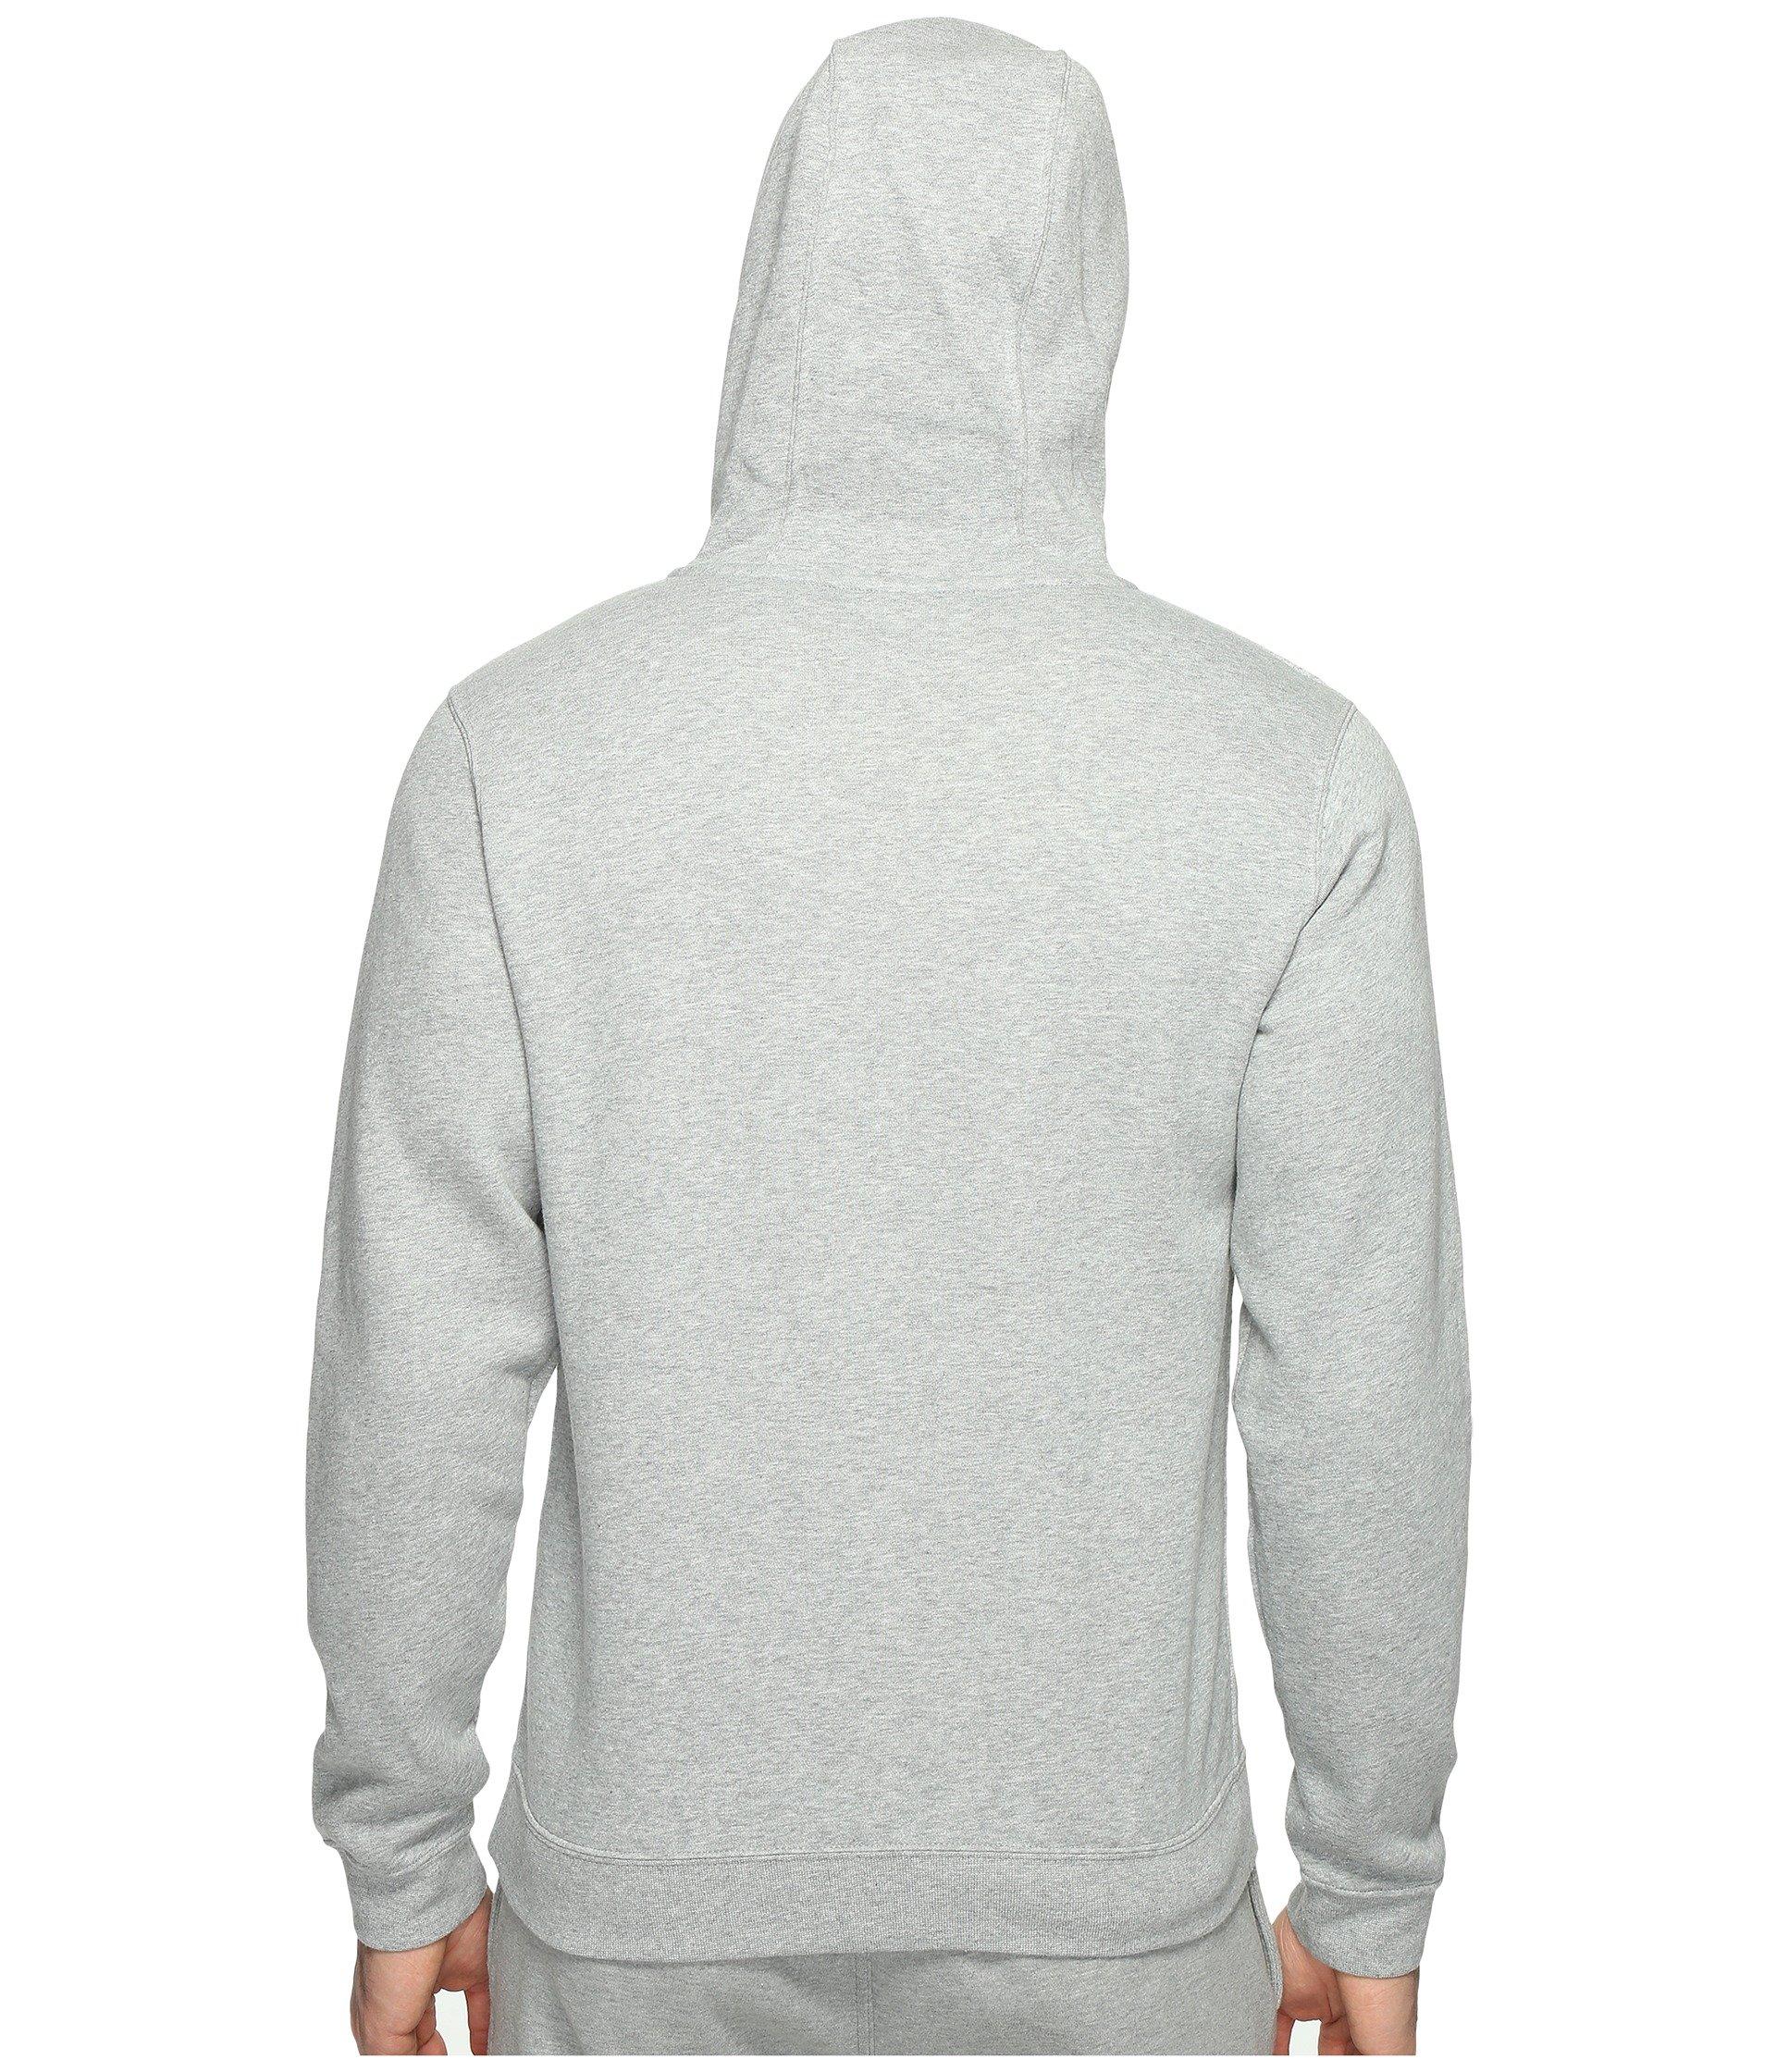 zip Dark Grey Fleece Heather white Nike Hoodie Full Heather Club dark nFZwXgH